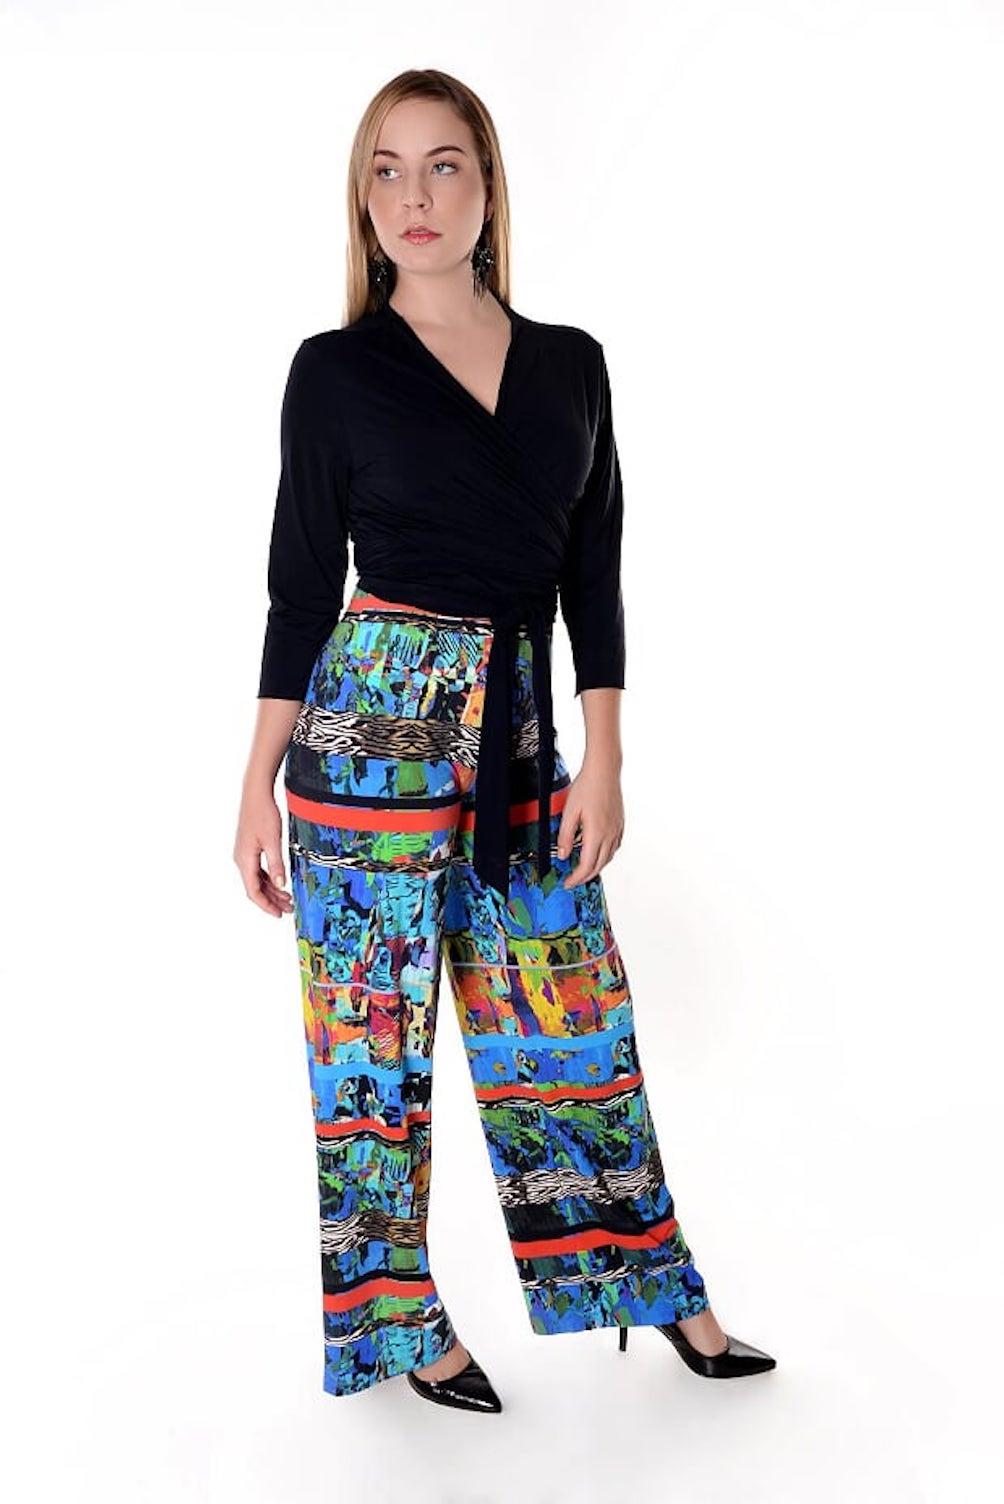 Pantalona Estampada em Malha